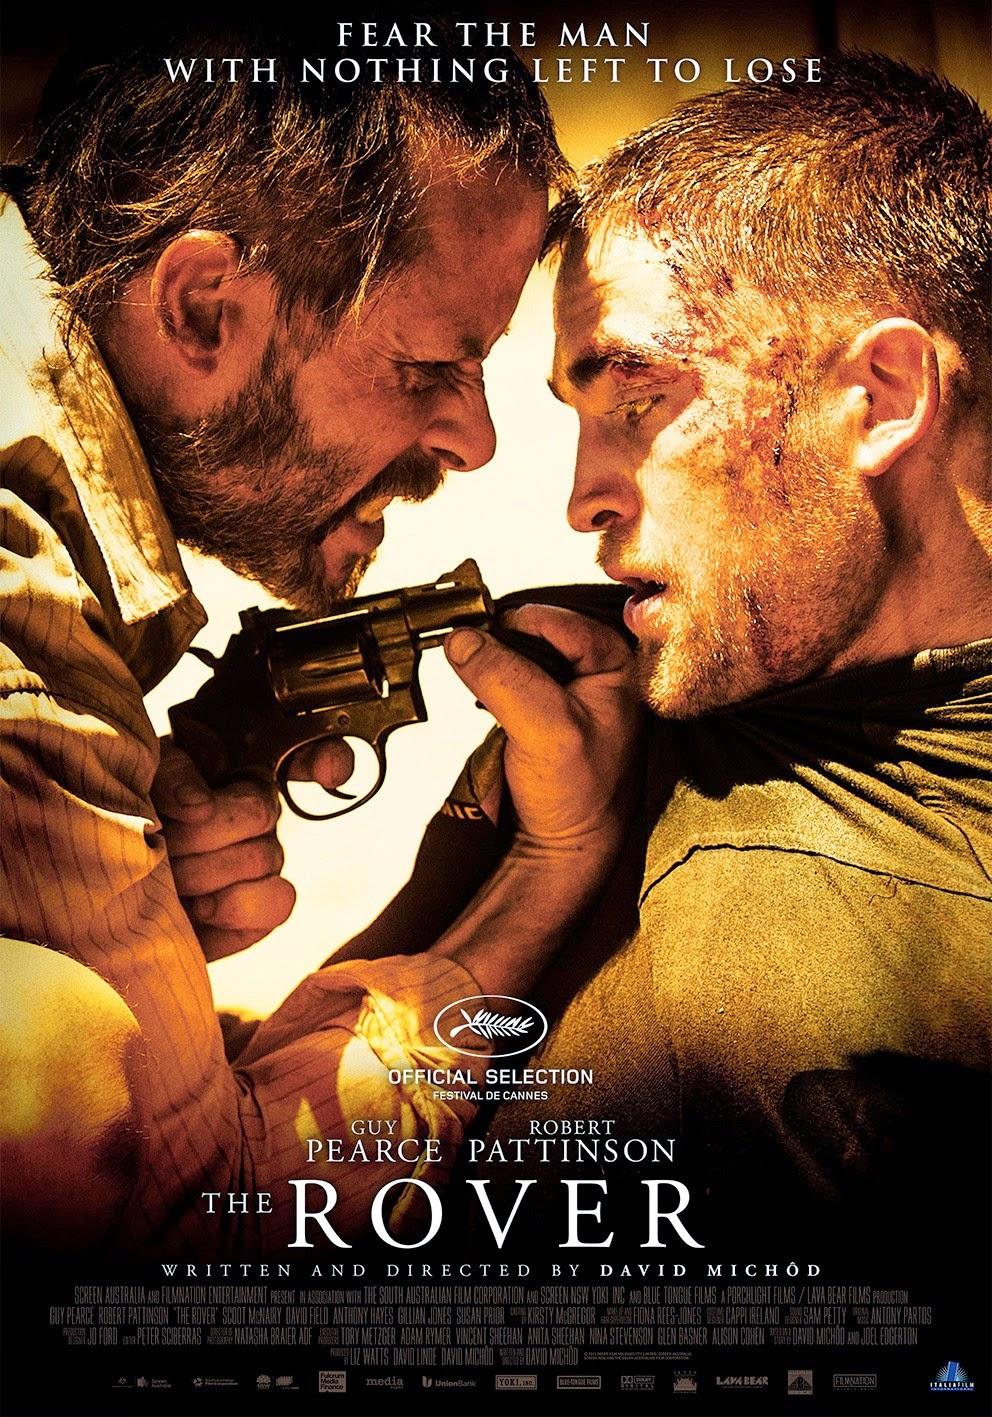 The Rover (2014) ดุกระแทกเดือด [HD][พากย์ไทย]